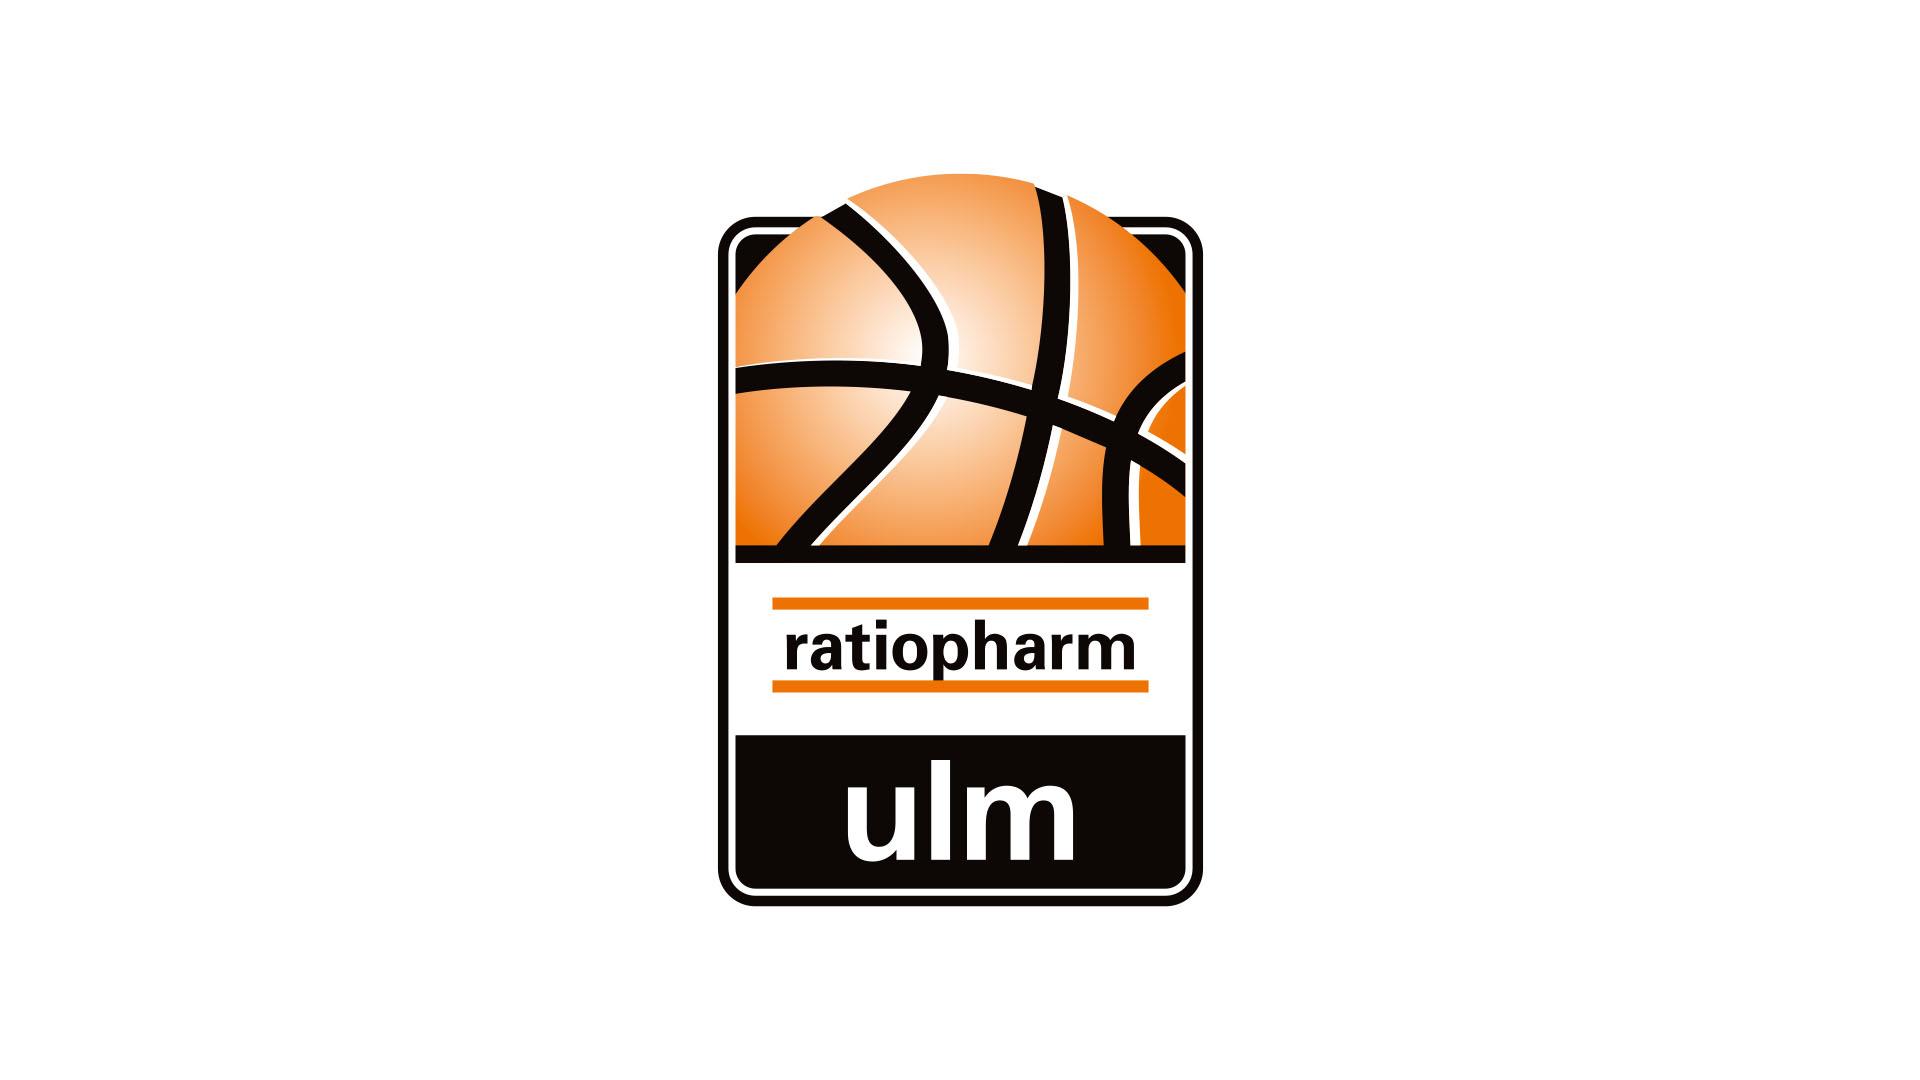 ratiopharm-ulm